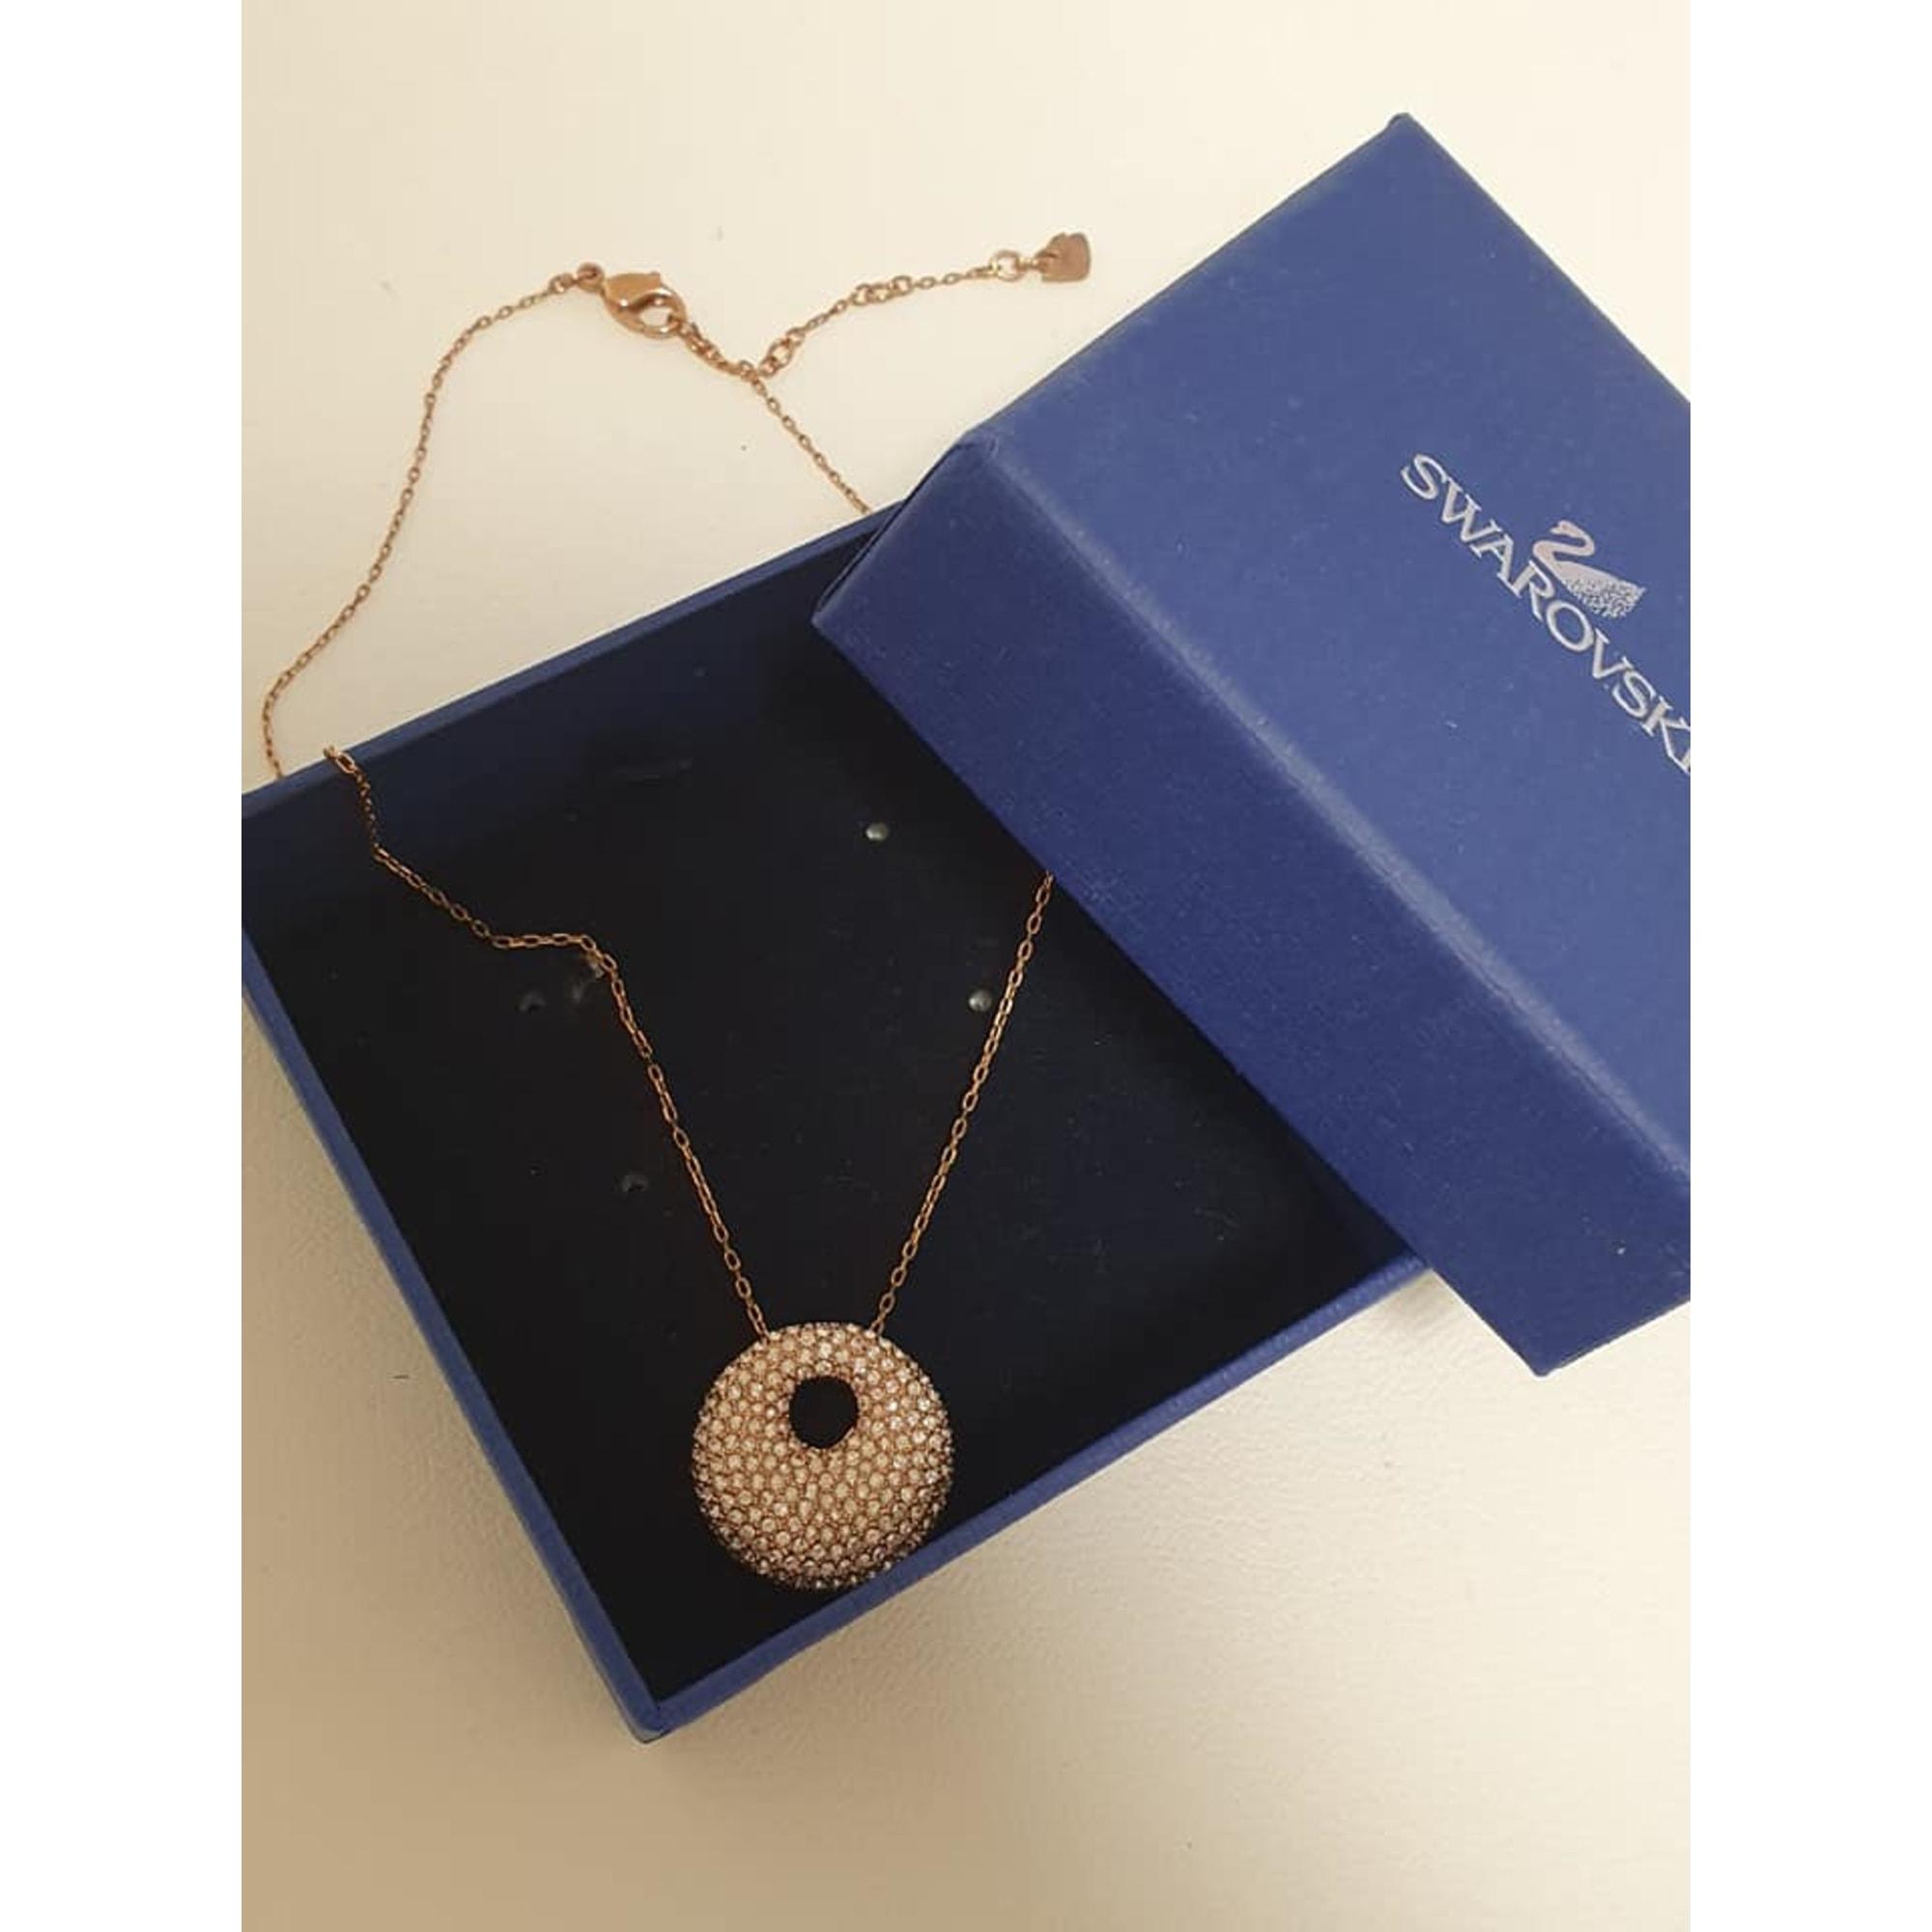 Pendentif, collier pendentif SWAROVSKI chrome doré